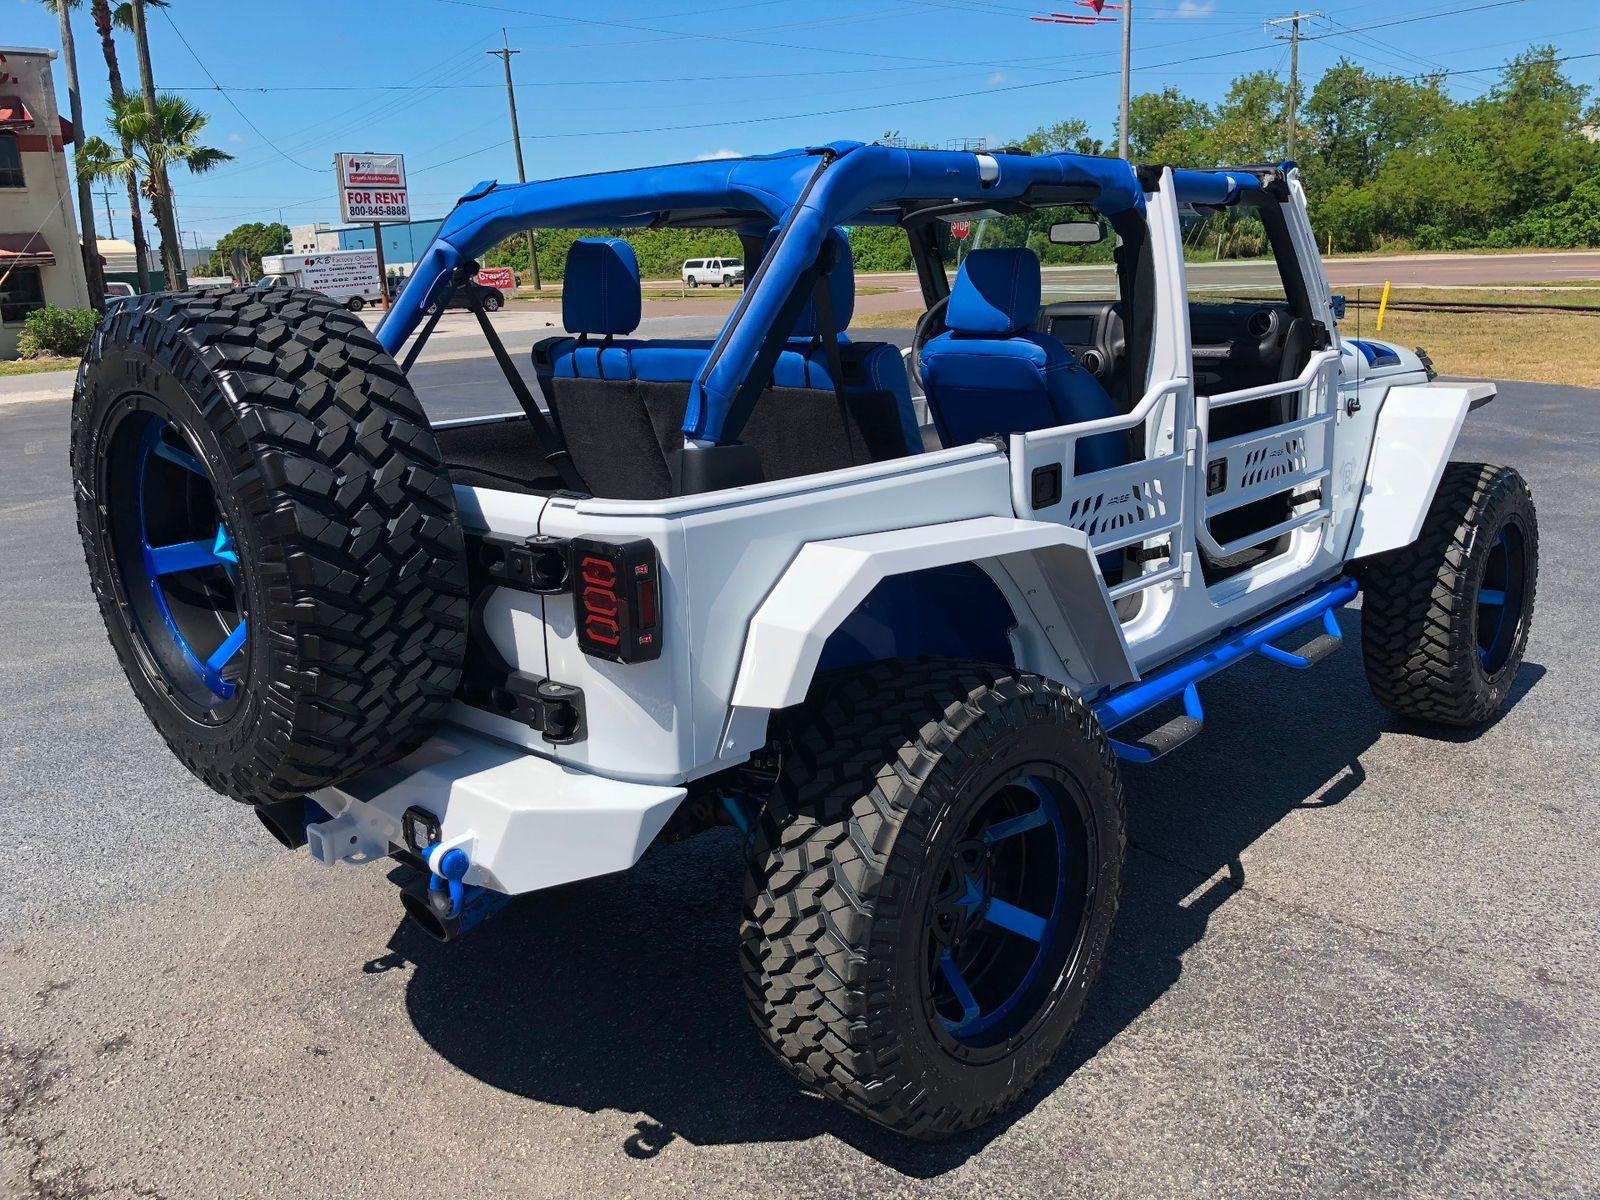 2018 jeep wrangler jk unlimited custom white n blue lifted leather hardtop florida bayshore. Black Bedroom Furniture Sets. Home Design Ideas